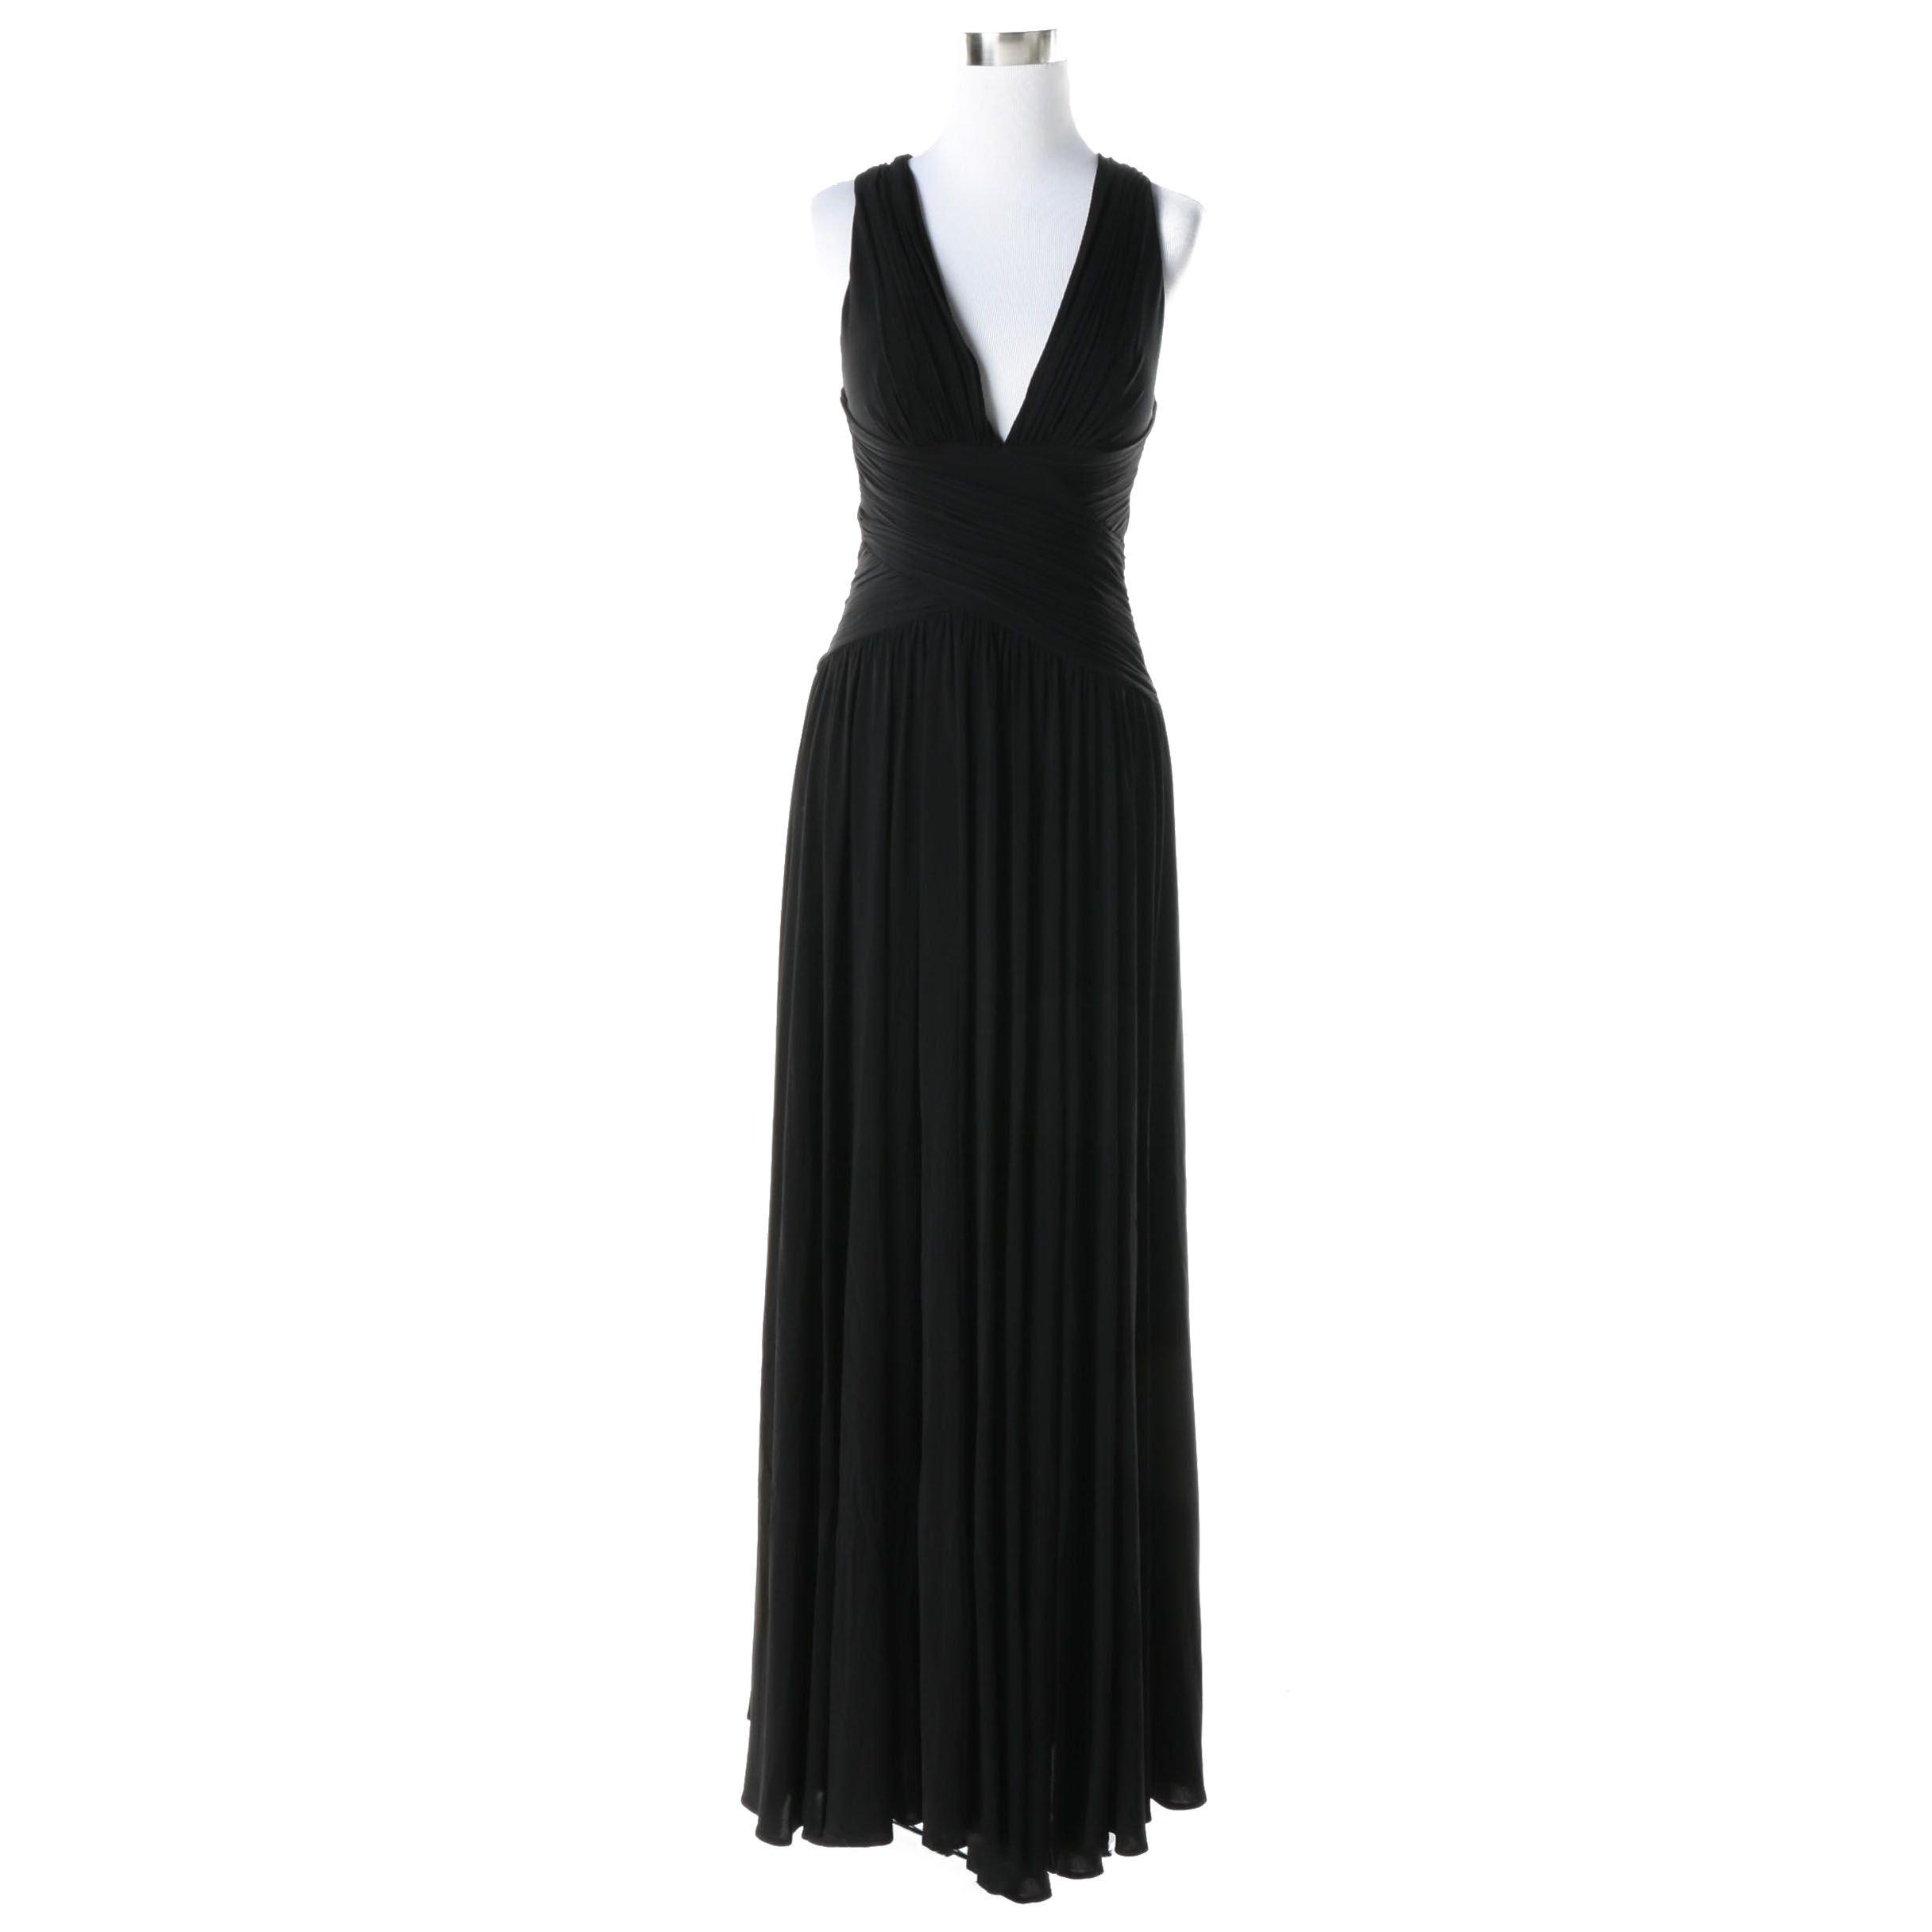 BCBG MaxAzria Black Sleeveless Evening Gown